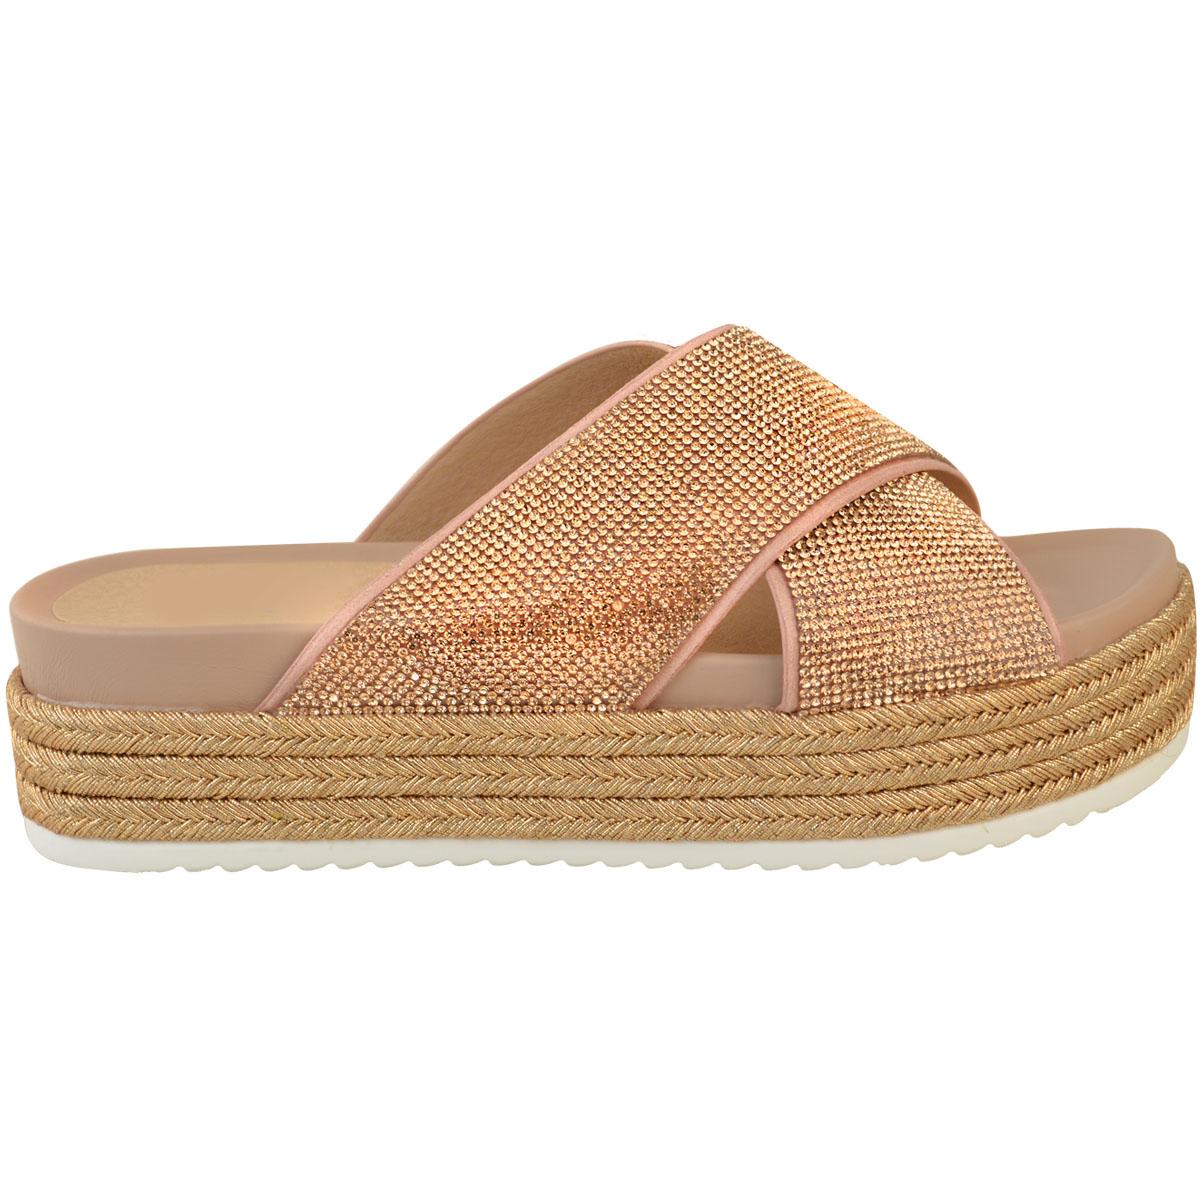 Womens-Ladies-Diamante-Slip-On-Sandals-Flatforms-Sparkly-Platform-Summer-Size-UK thumbnail 9